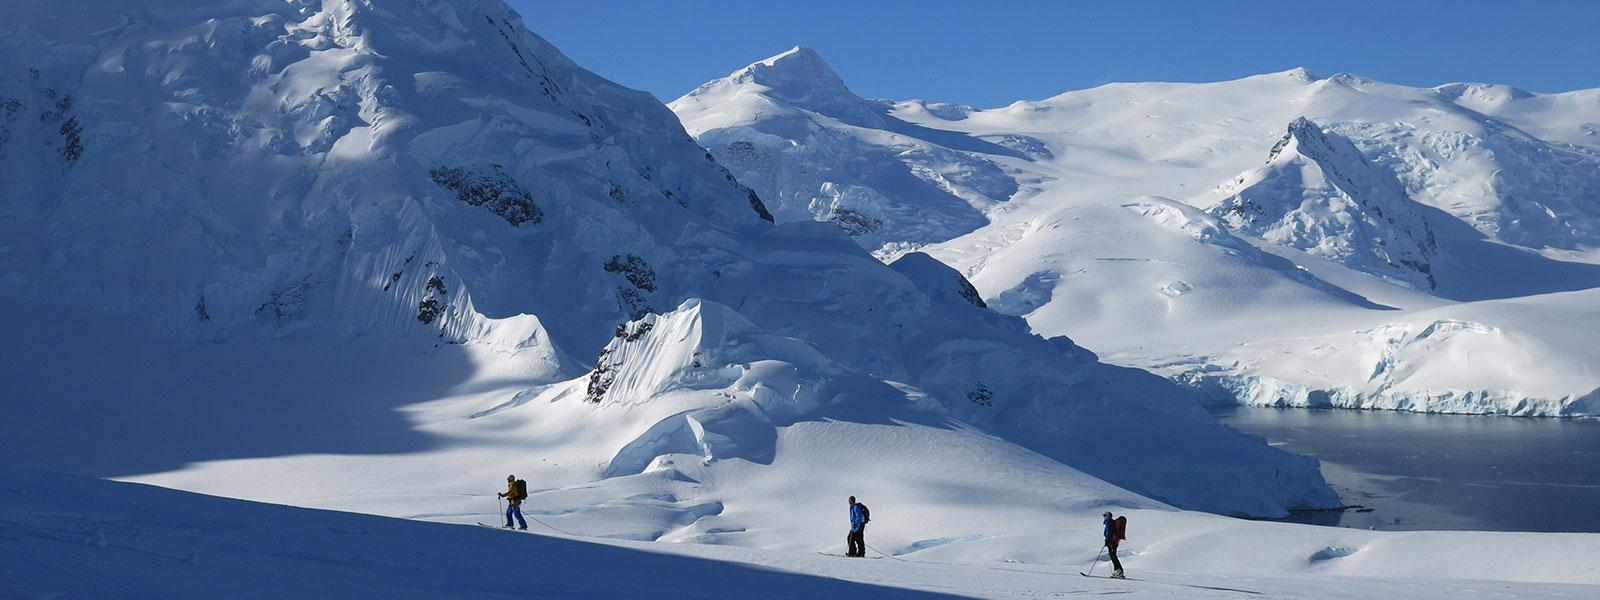 antarctica ski touring adventure trip - customized tailor made